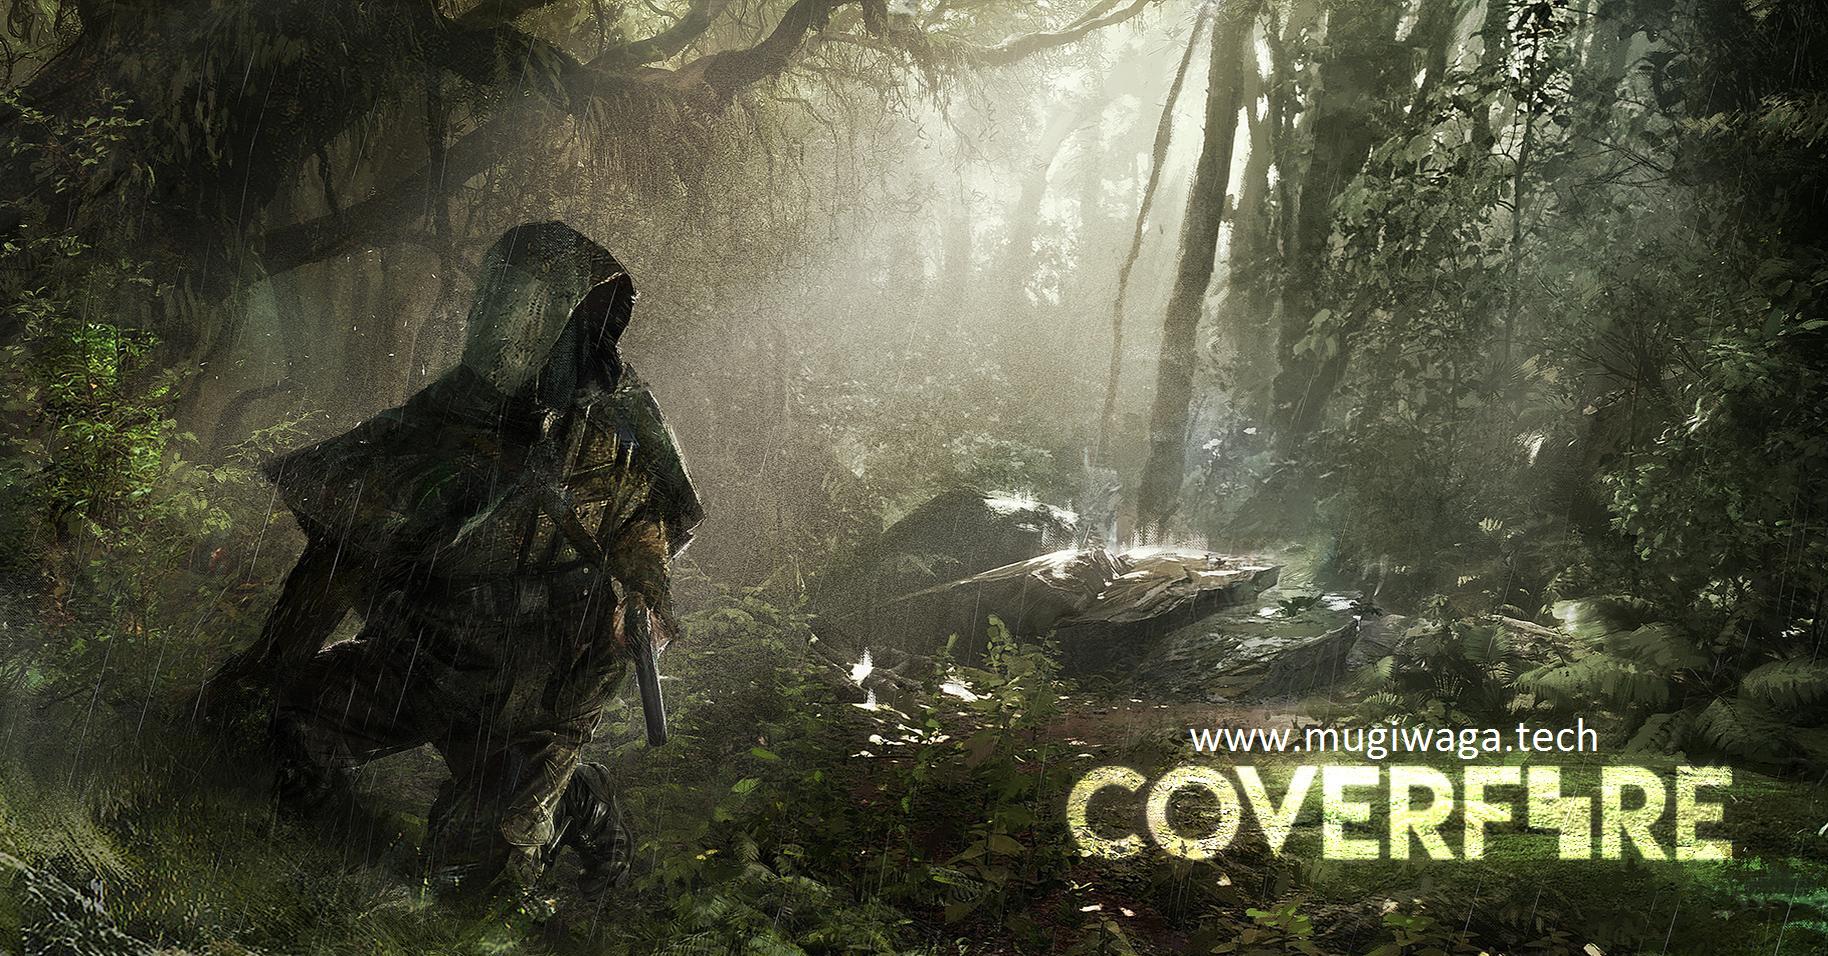 cover-fire-mod-apk